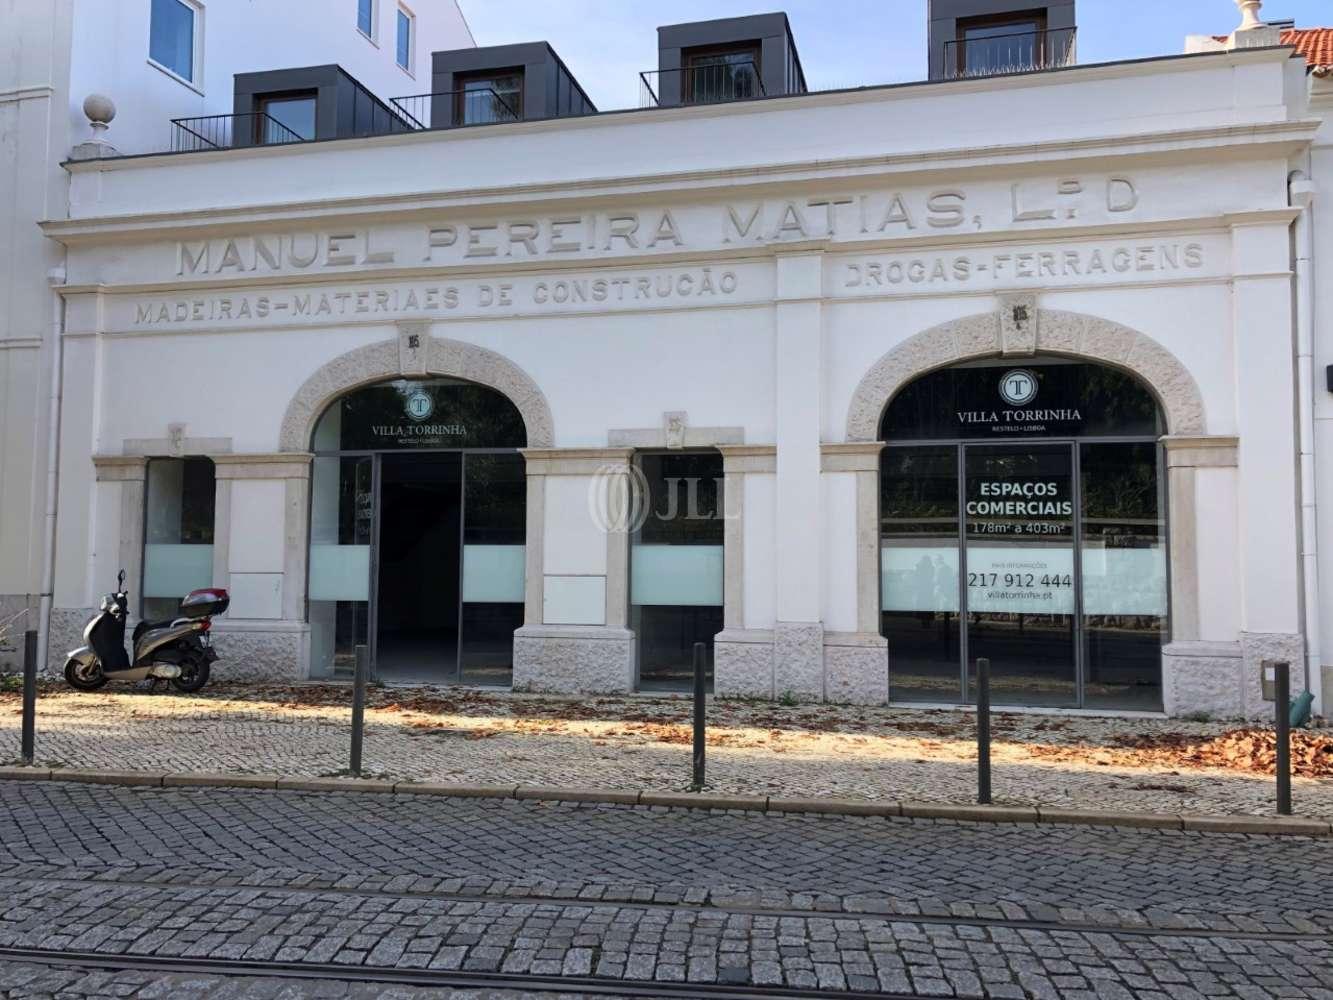 Loja Lisboa,  - Loja localizada na Rua de Pedrouços, Belém